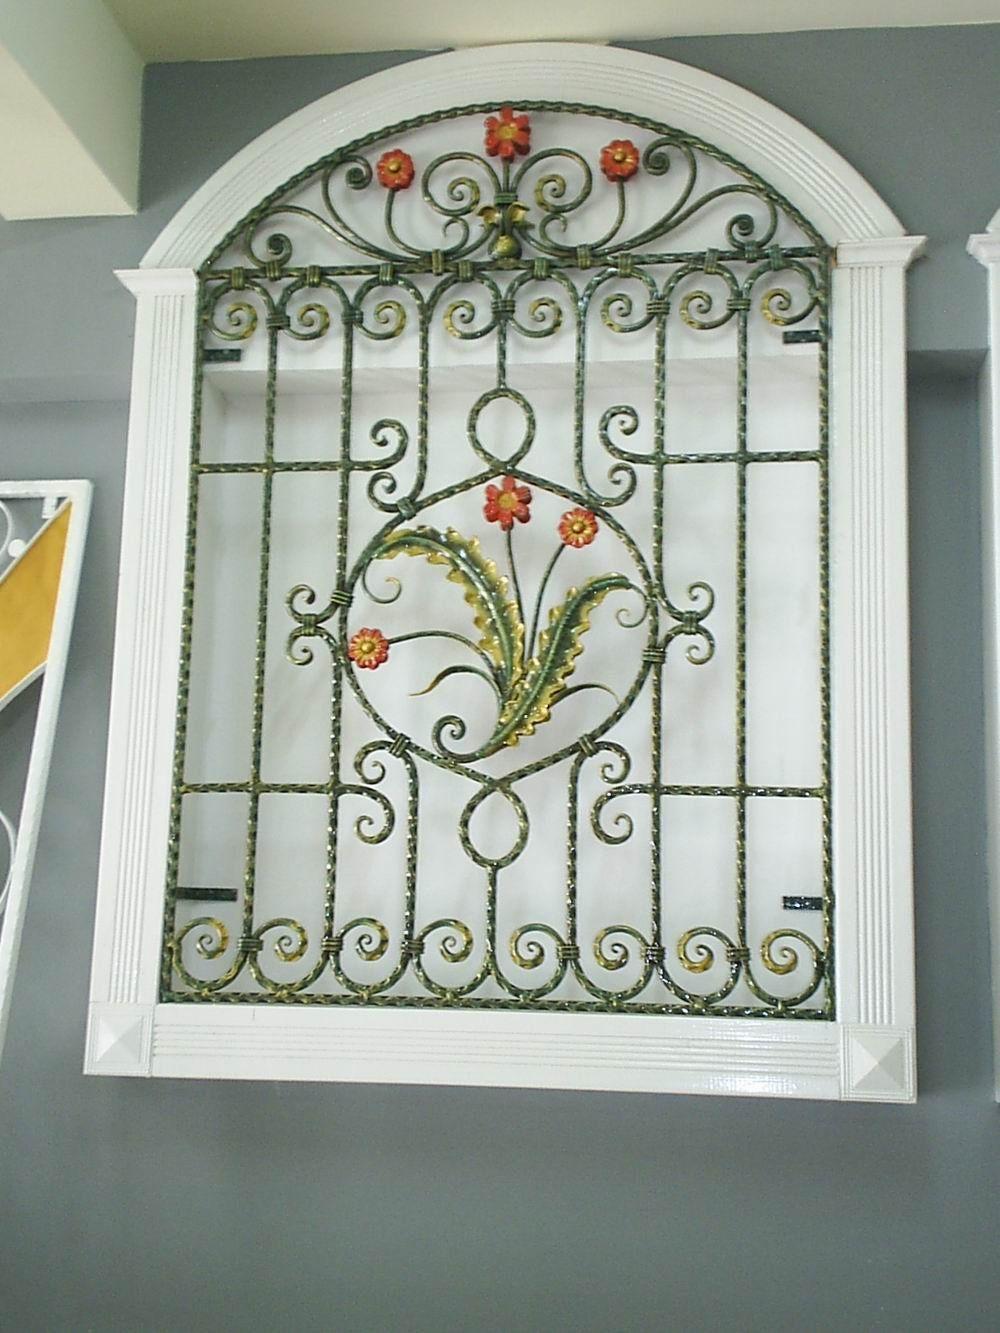 Classical Window Grill Design Iron Windows Window Grill Window Grill Design,How To Start A Graphic Design Business